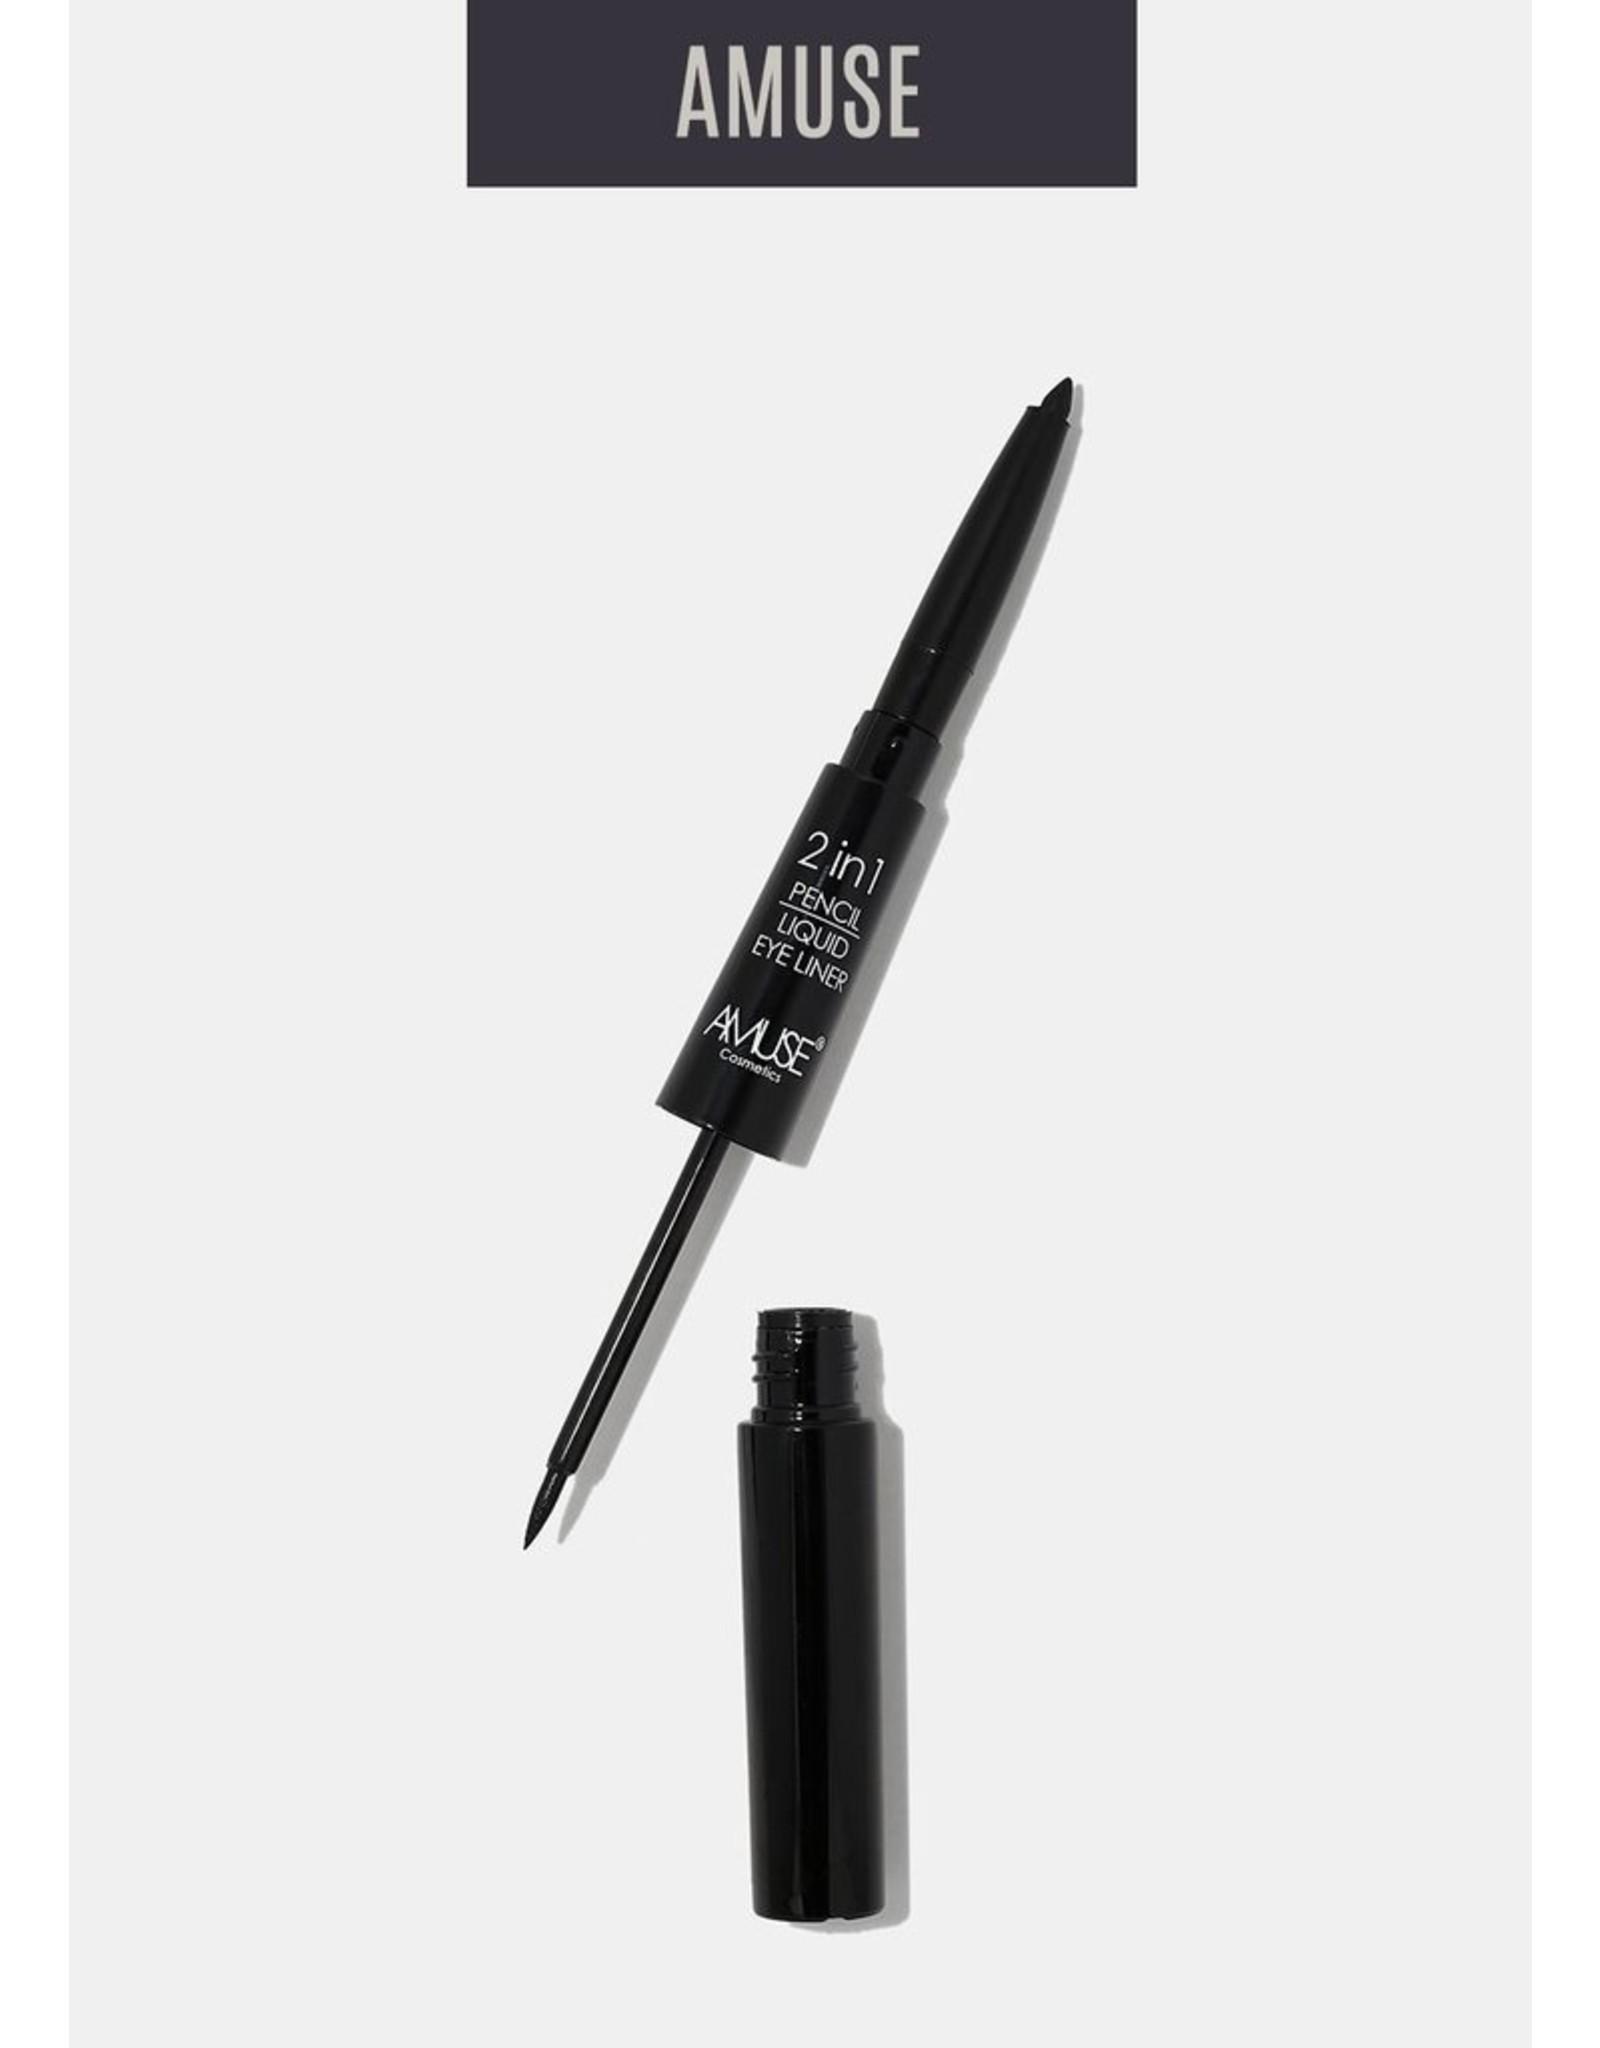 Amuse Cosmetics 2 IN 1 Pencil / Liquid Eyeliner